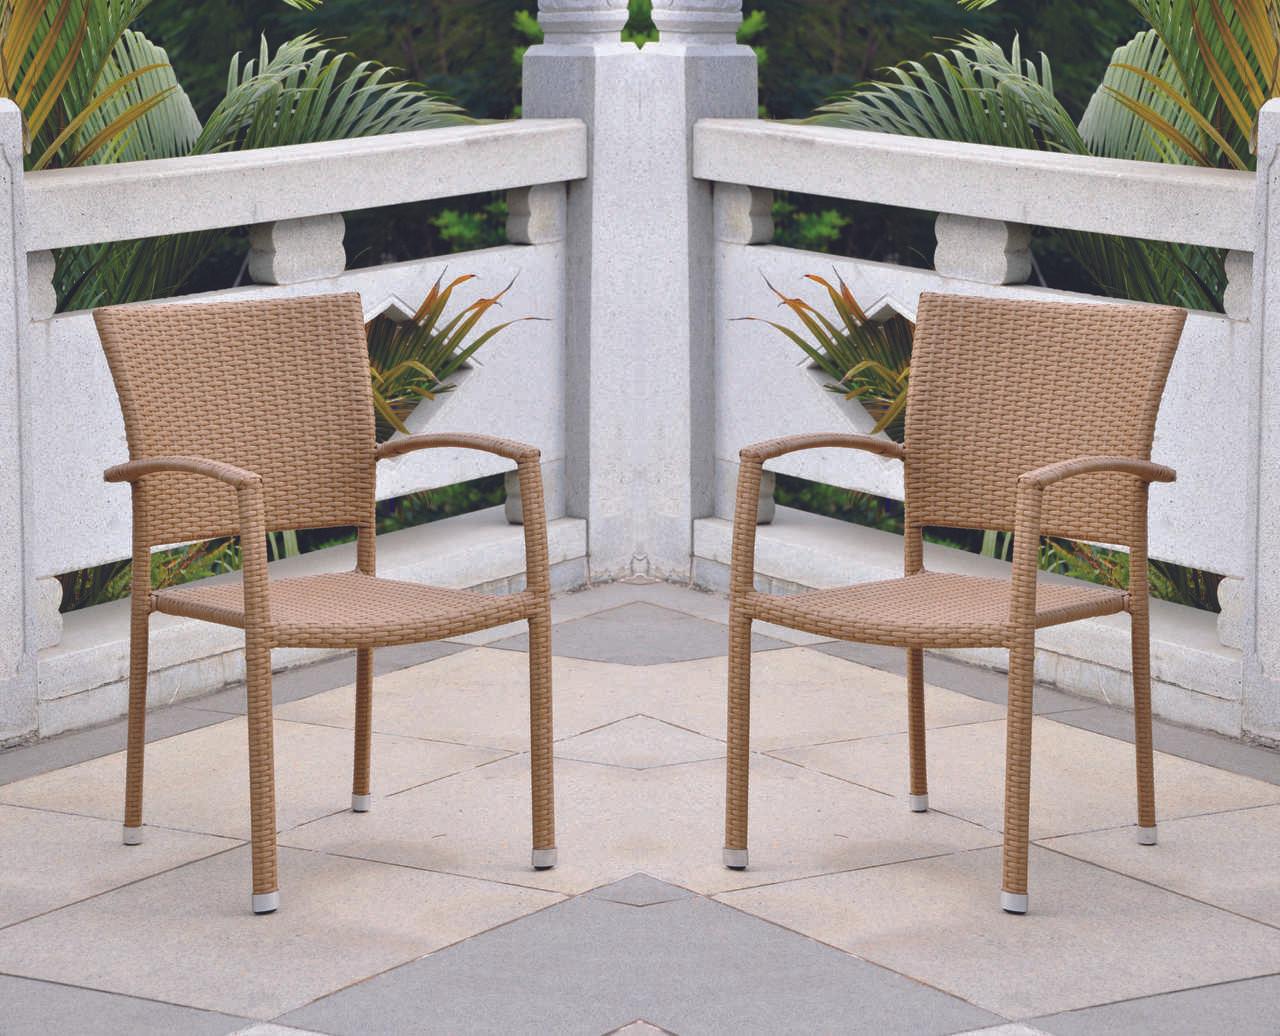 International Caravan Patio Furniture.International Caravan Barcelona Resin Wicker Square Back Dining Chair Set Of 6